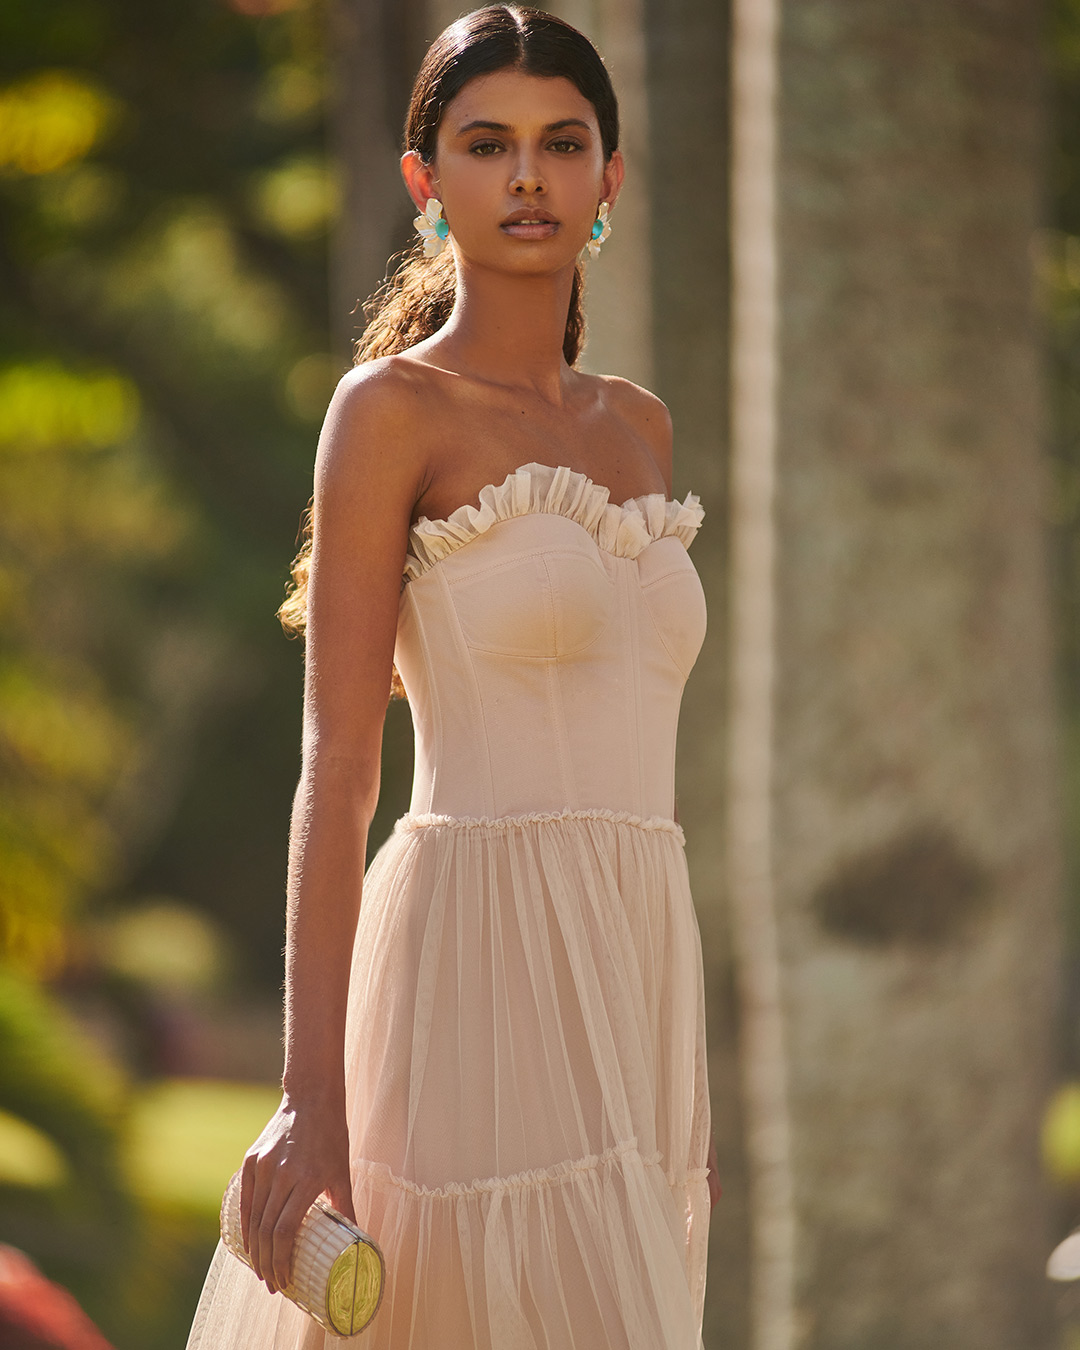 Vestido corselet de tule com mangas avulsas